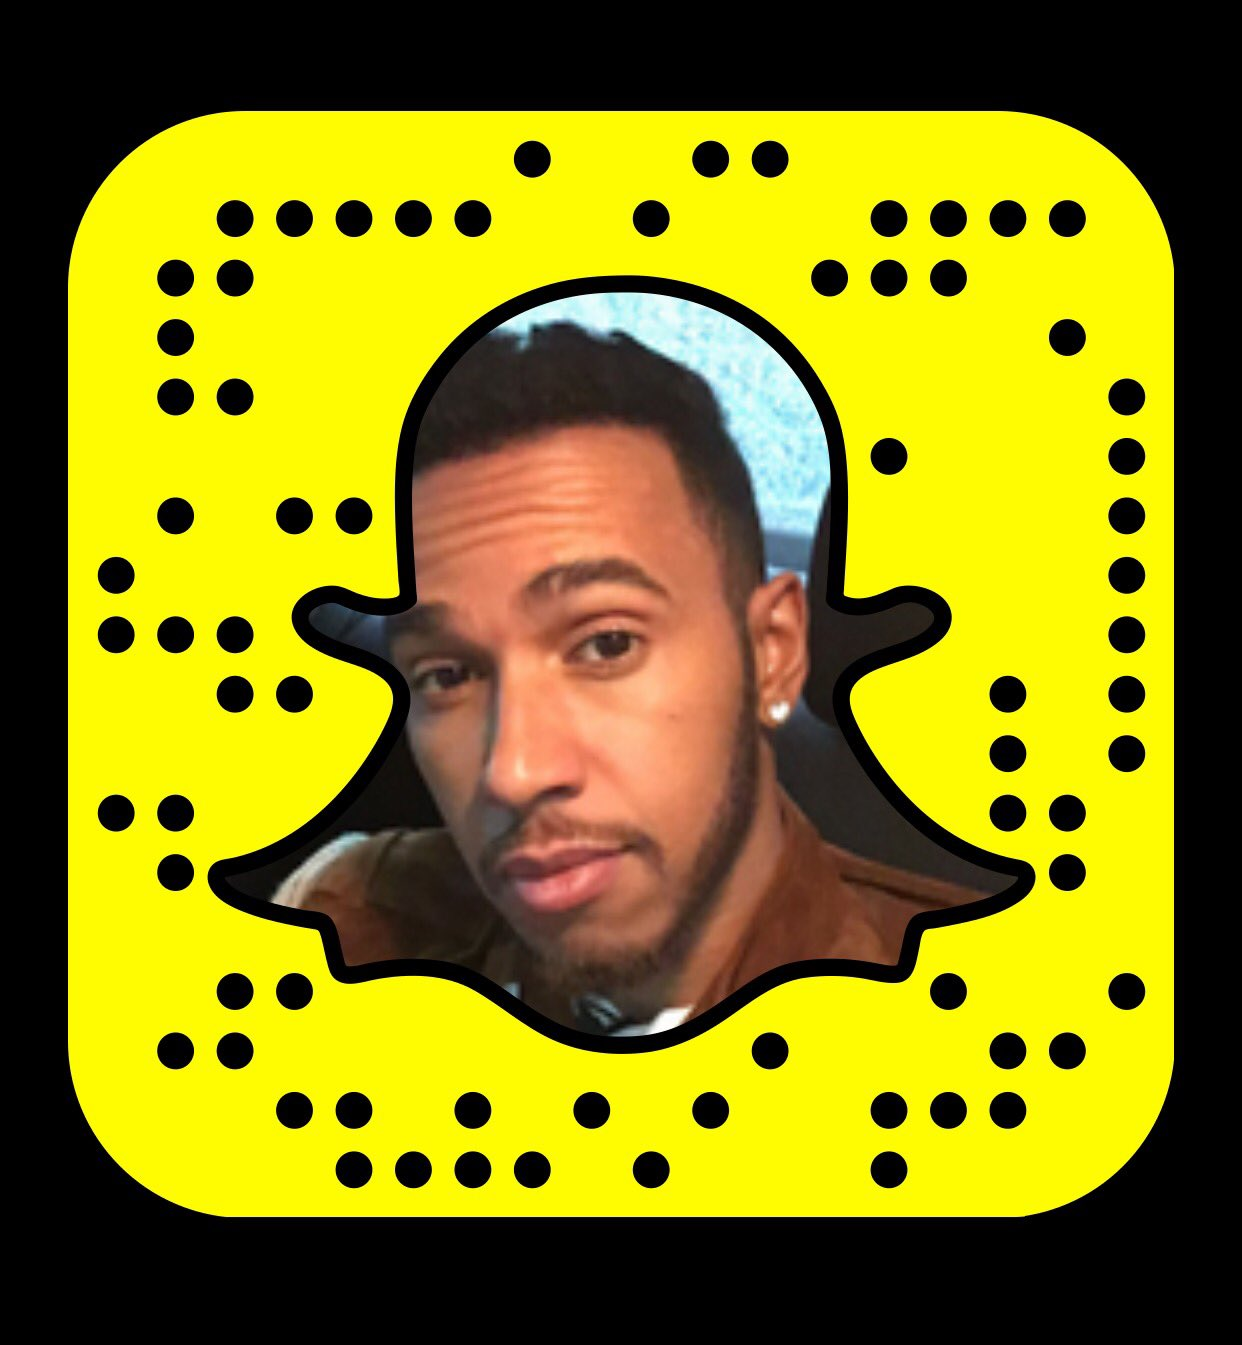 If you don't already, follow me on Snapchat! 👻👻👻 https://t.co/NxpvBUTPl3